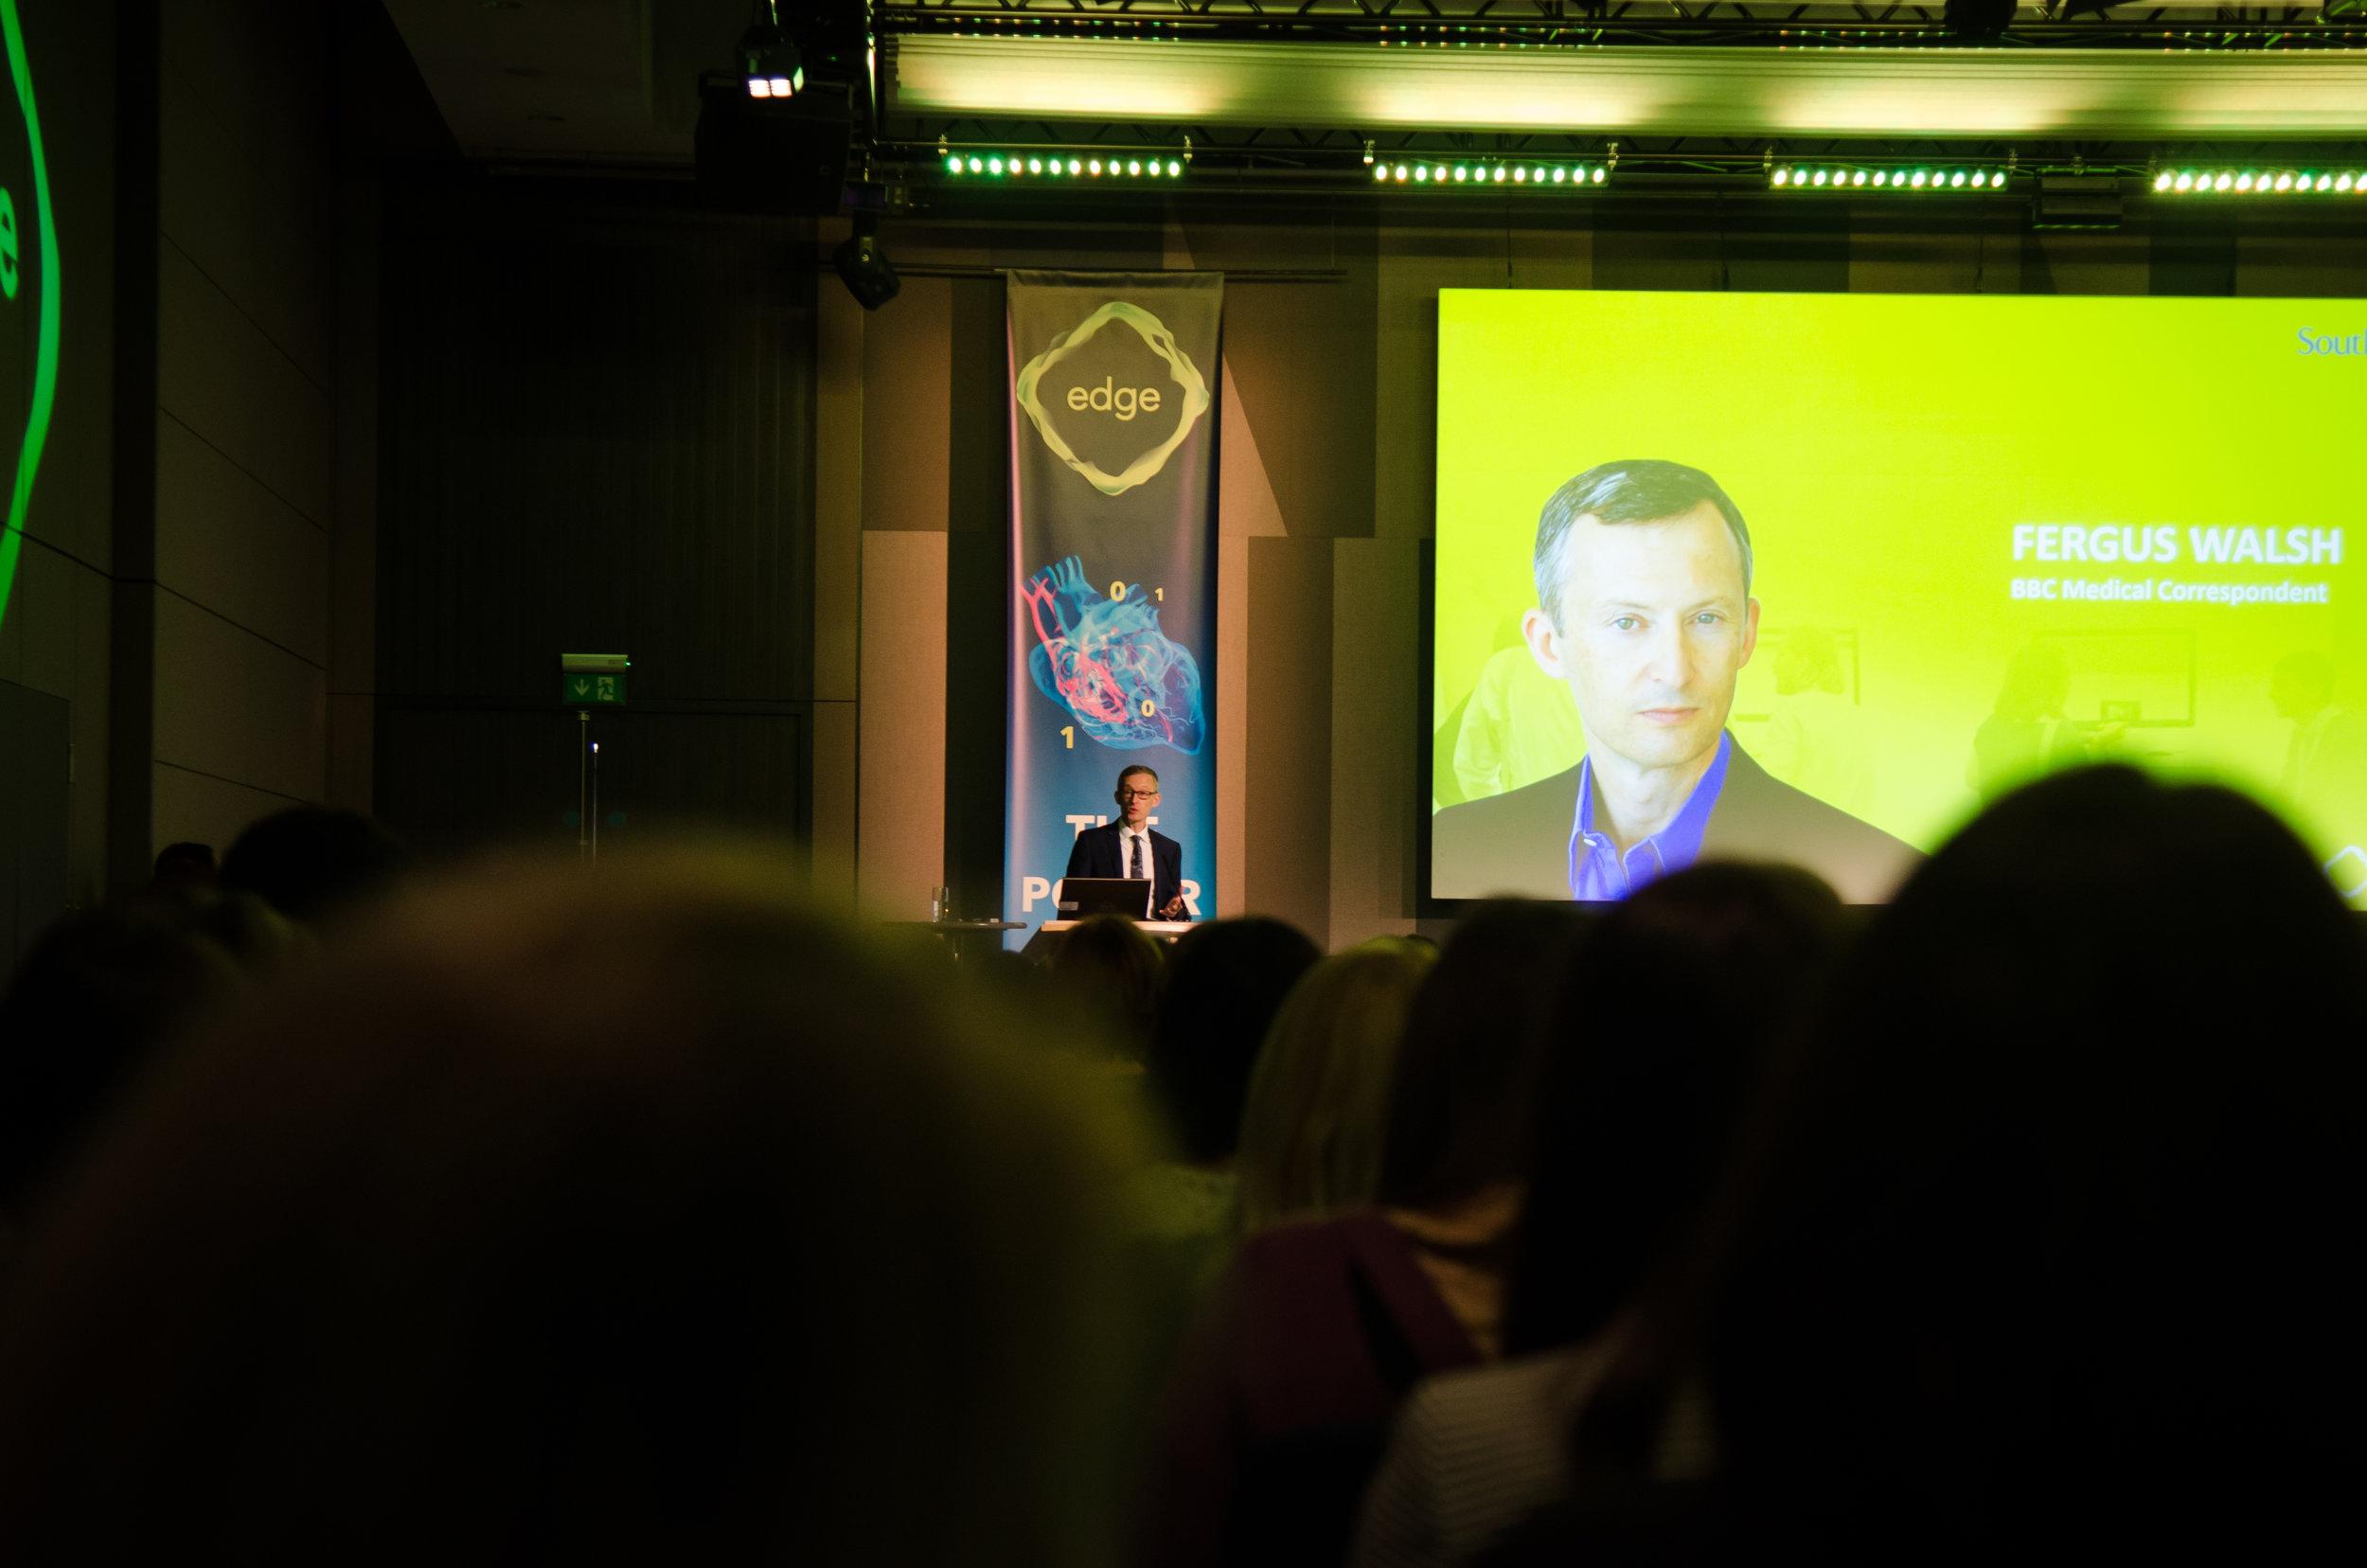 EDGE_Conference (22) fergus on screen.jpg